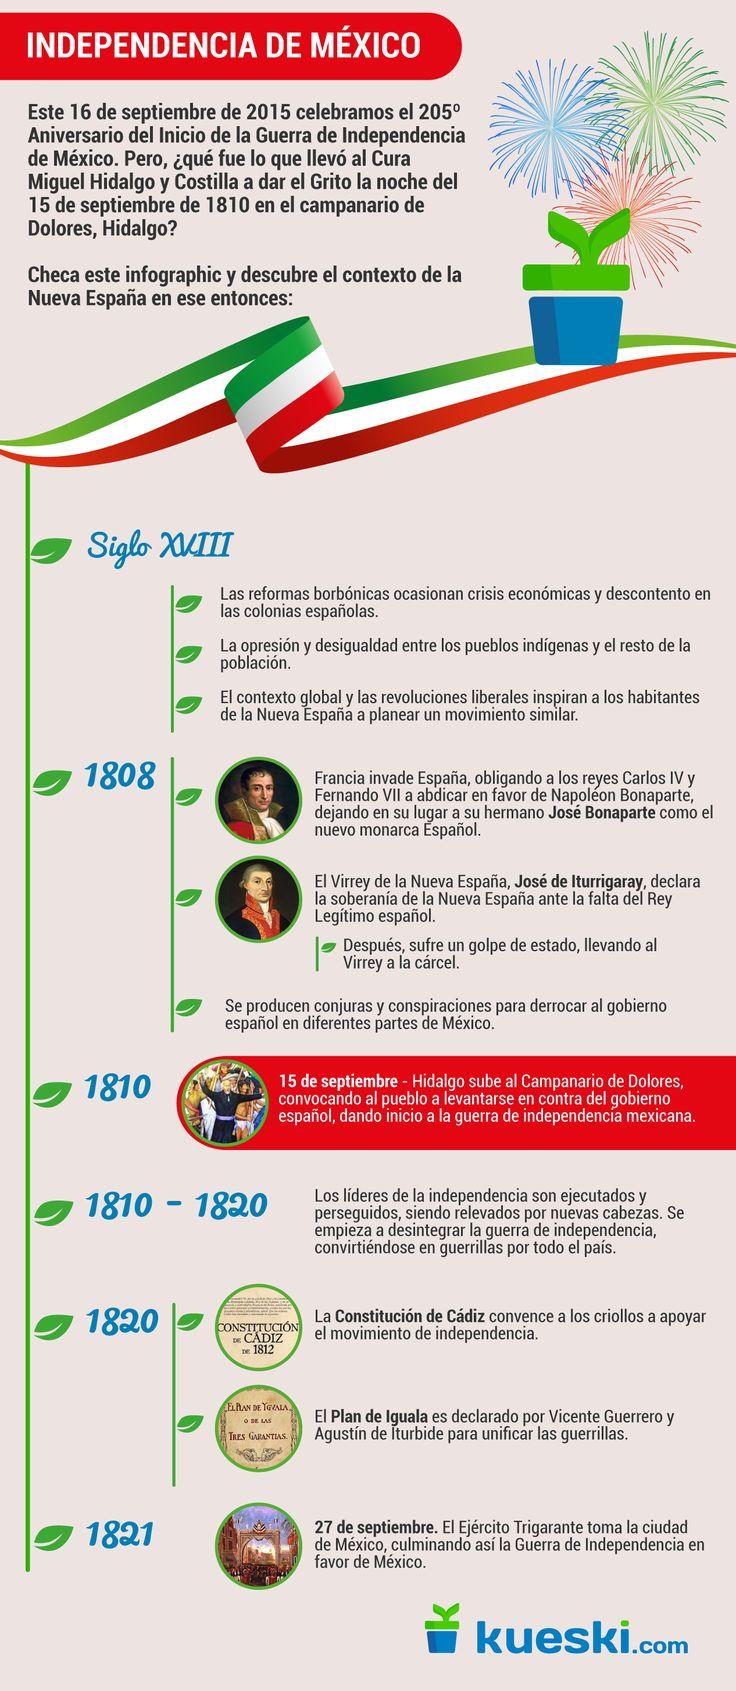 [INFOGRAFÍA] Día de la independencia de México #VivaMéxico